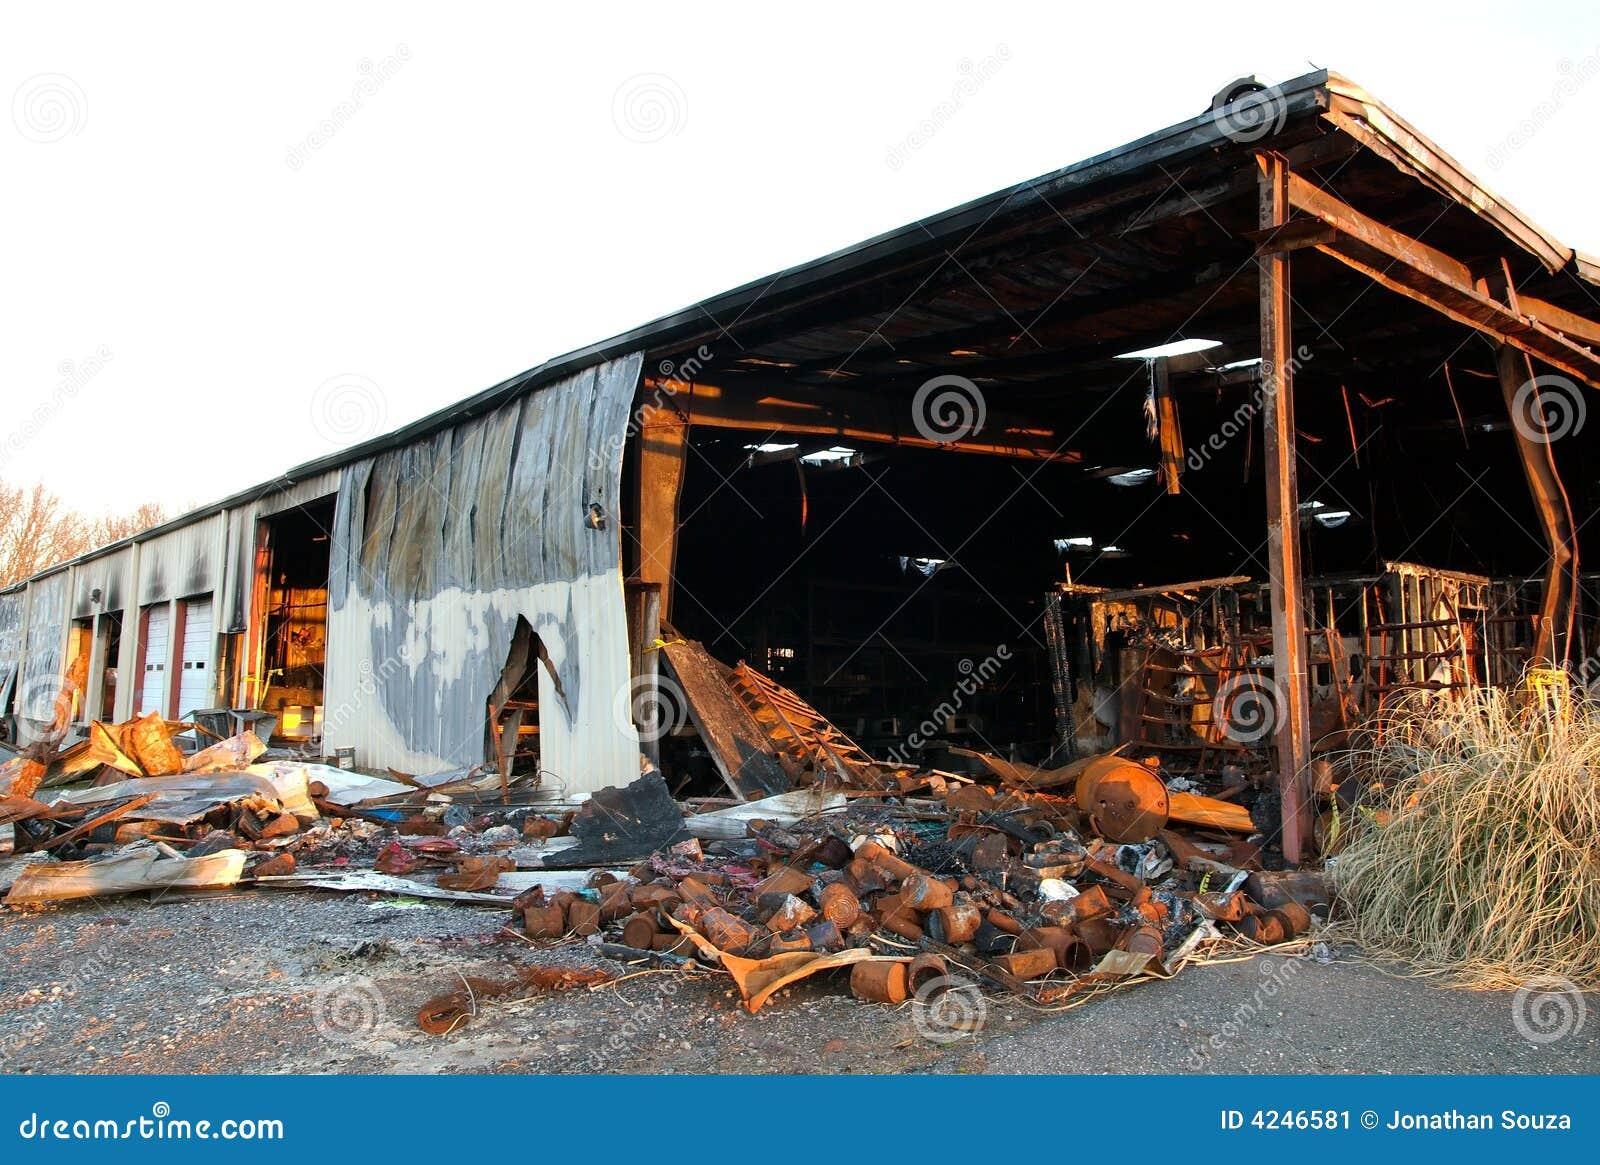 The destruction of fire 02